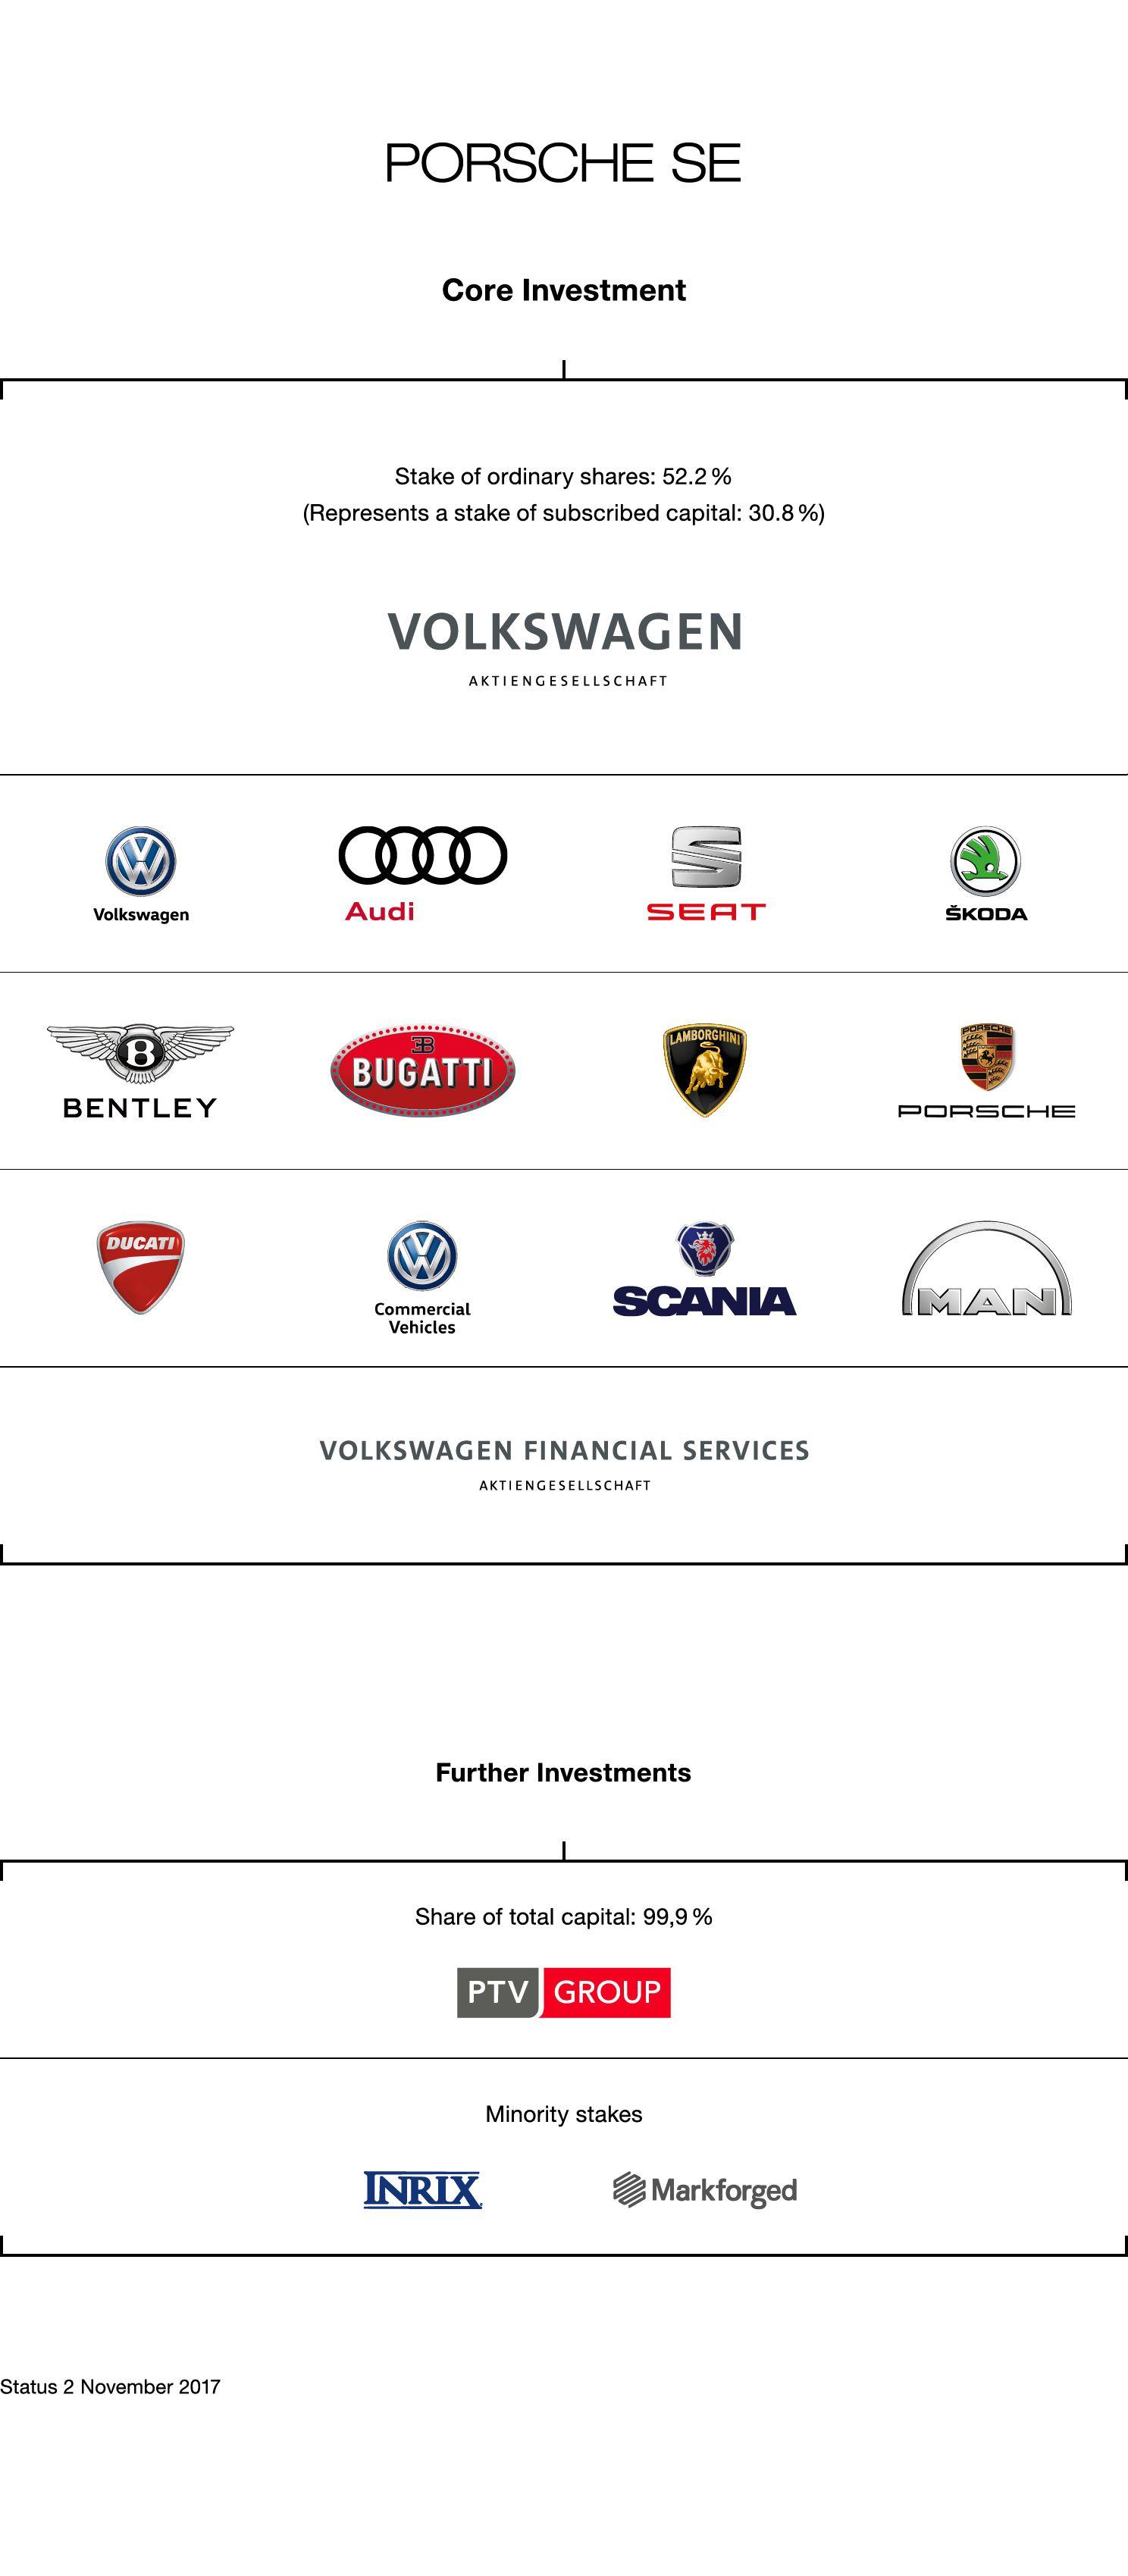 Porsche SE: Holding structure